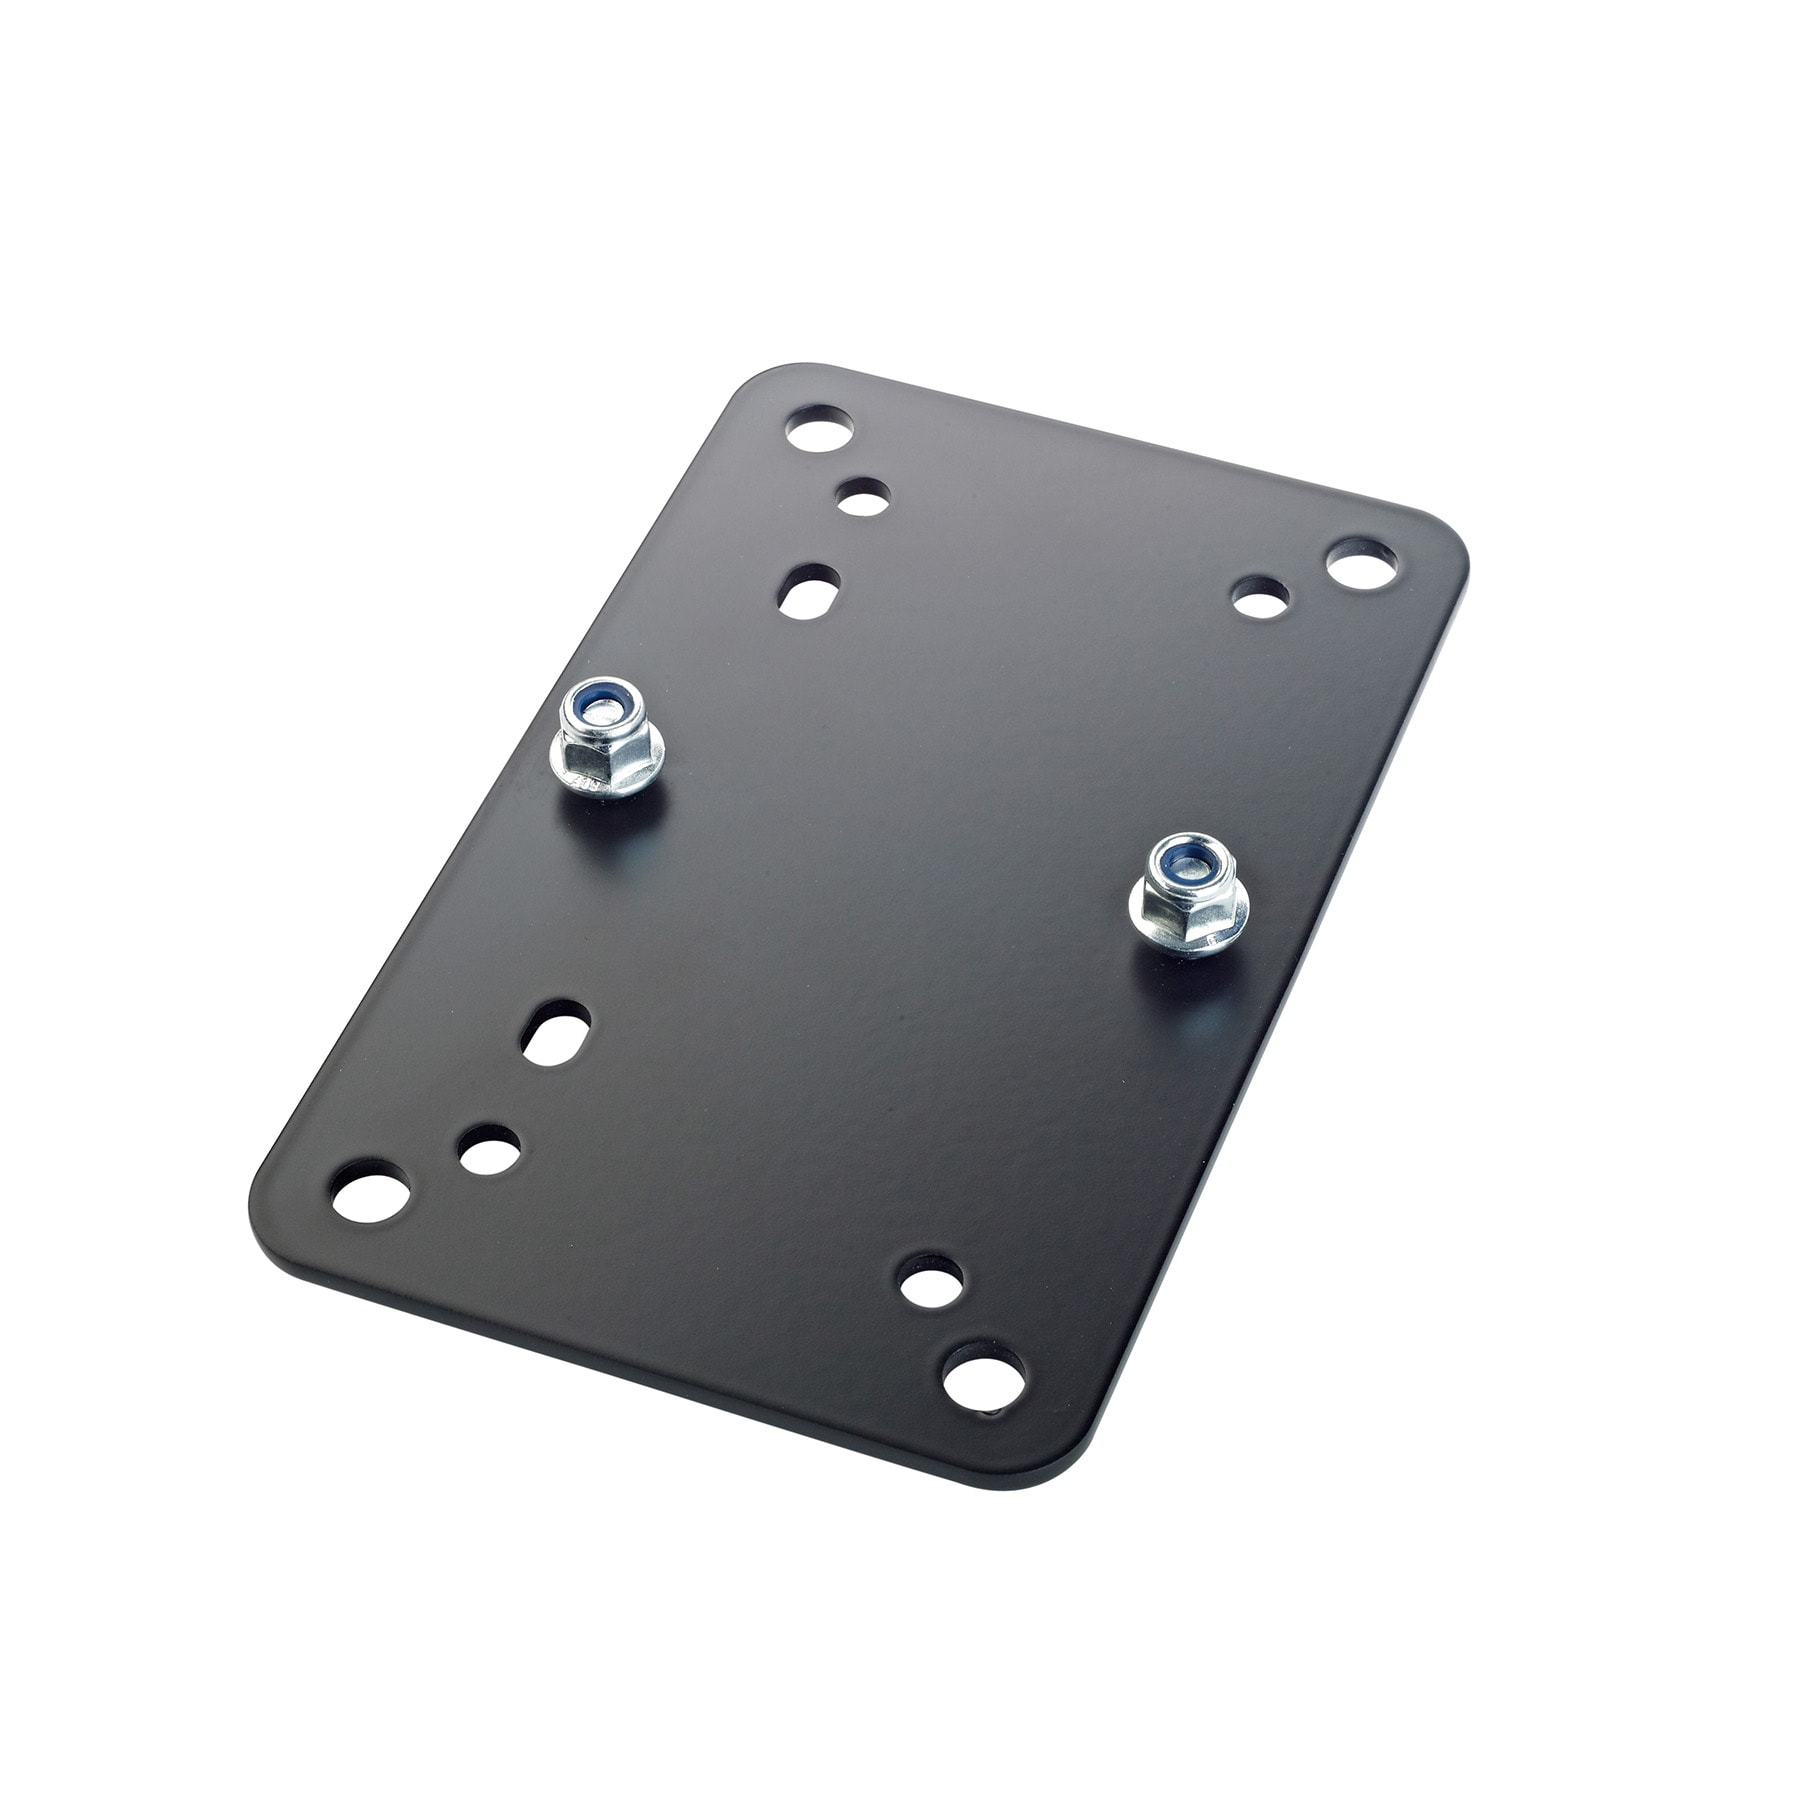 KM24354 - Adapter panel 2